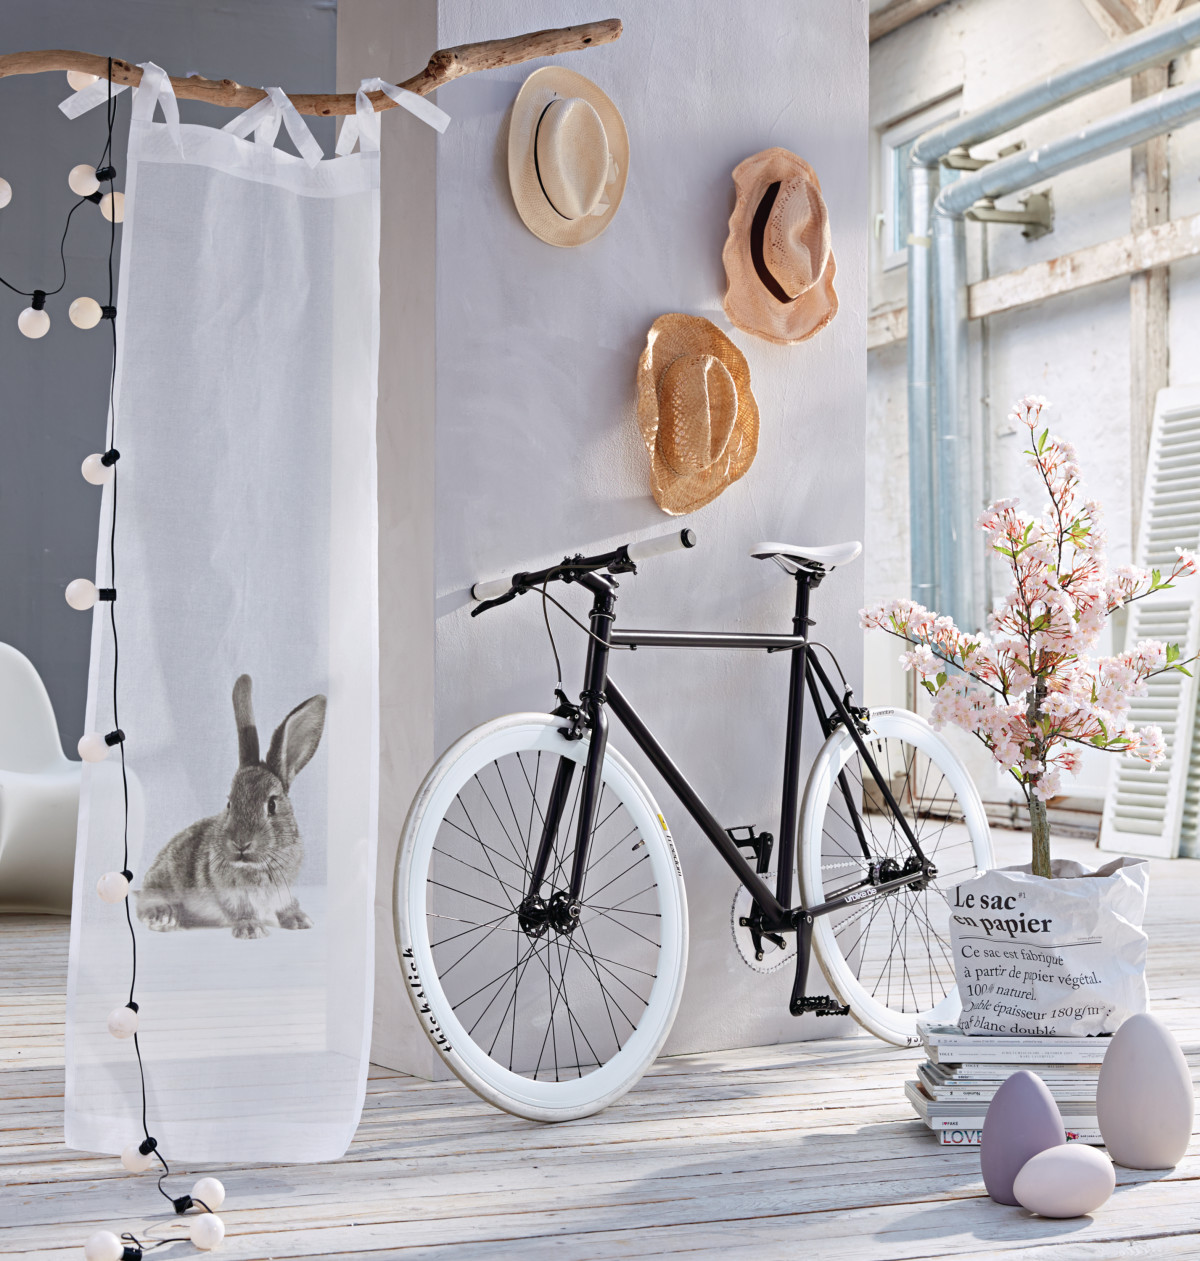 produkte aus vorh nge impressionen meine wunschliste. Black Bedroom Furniture Sets. Home Design Ideas